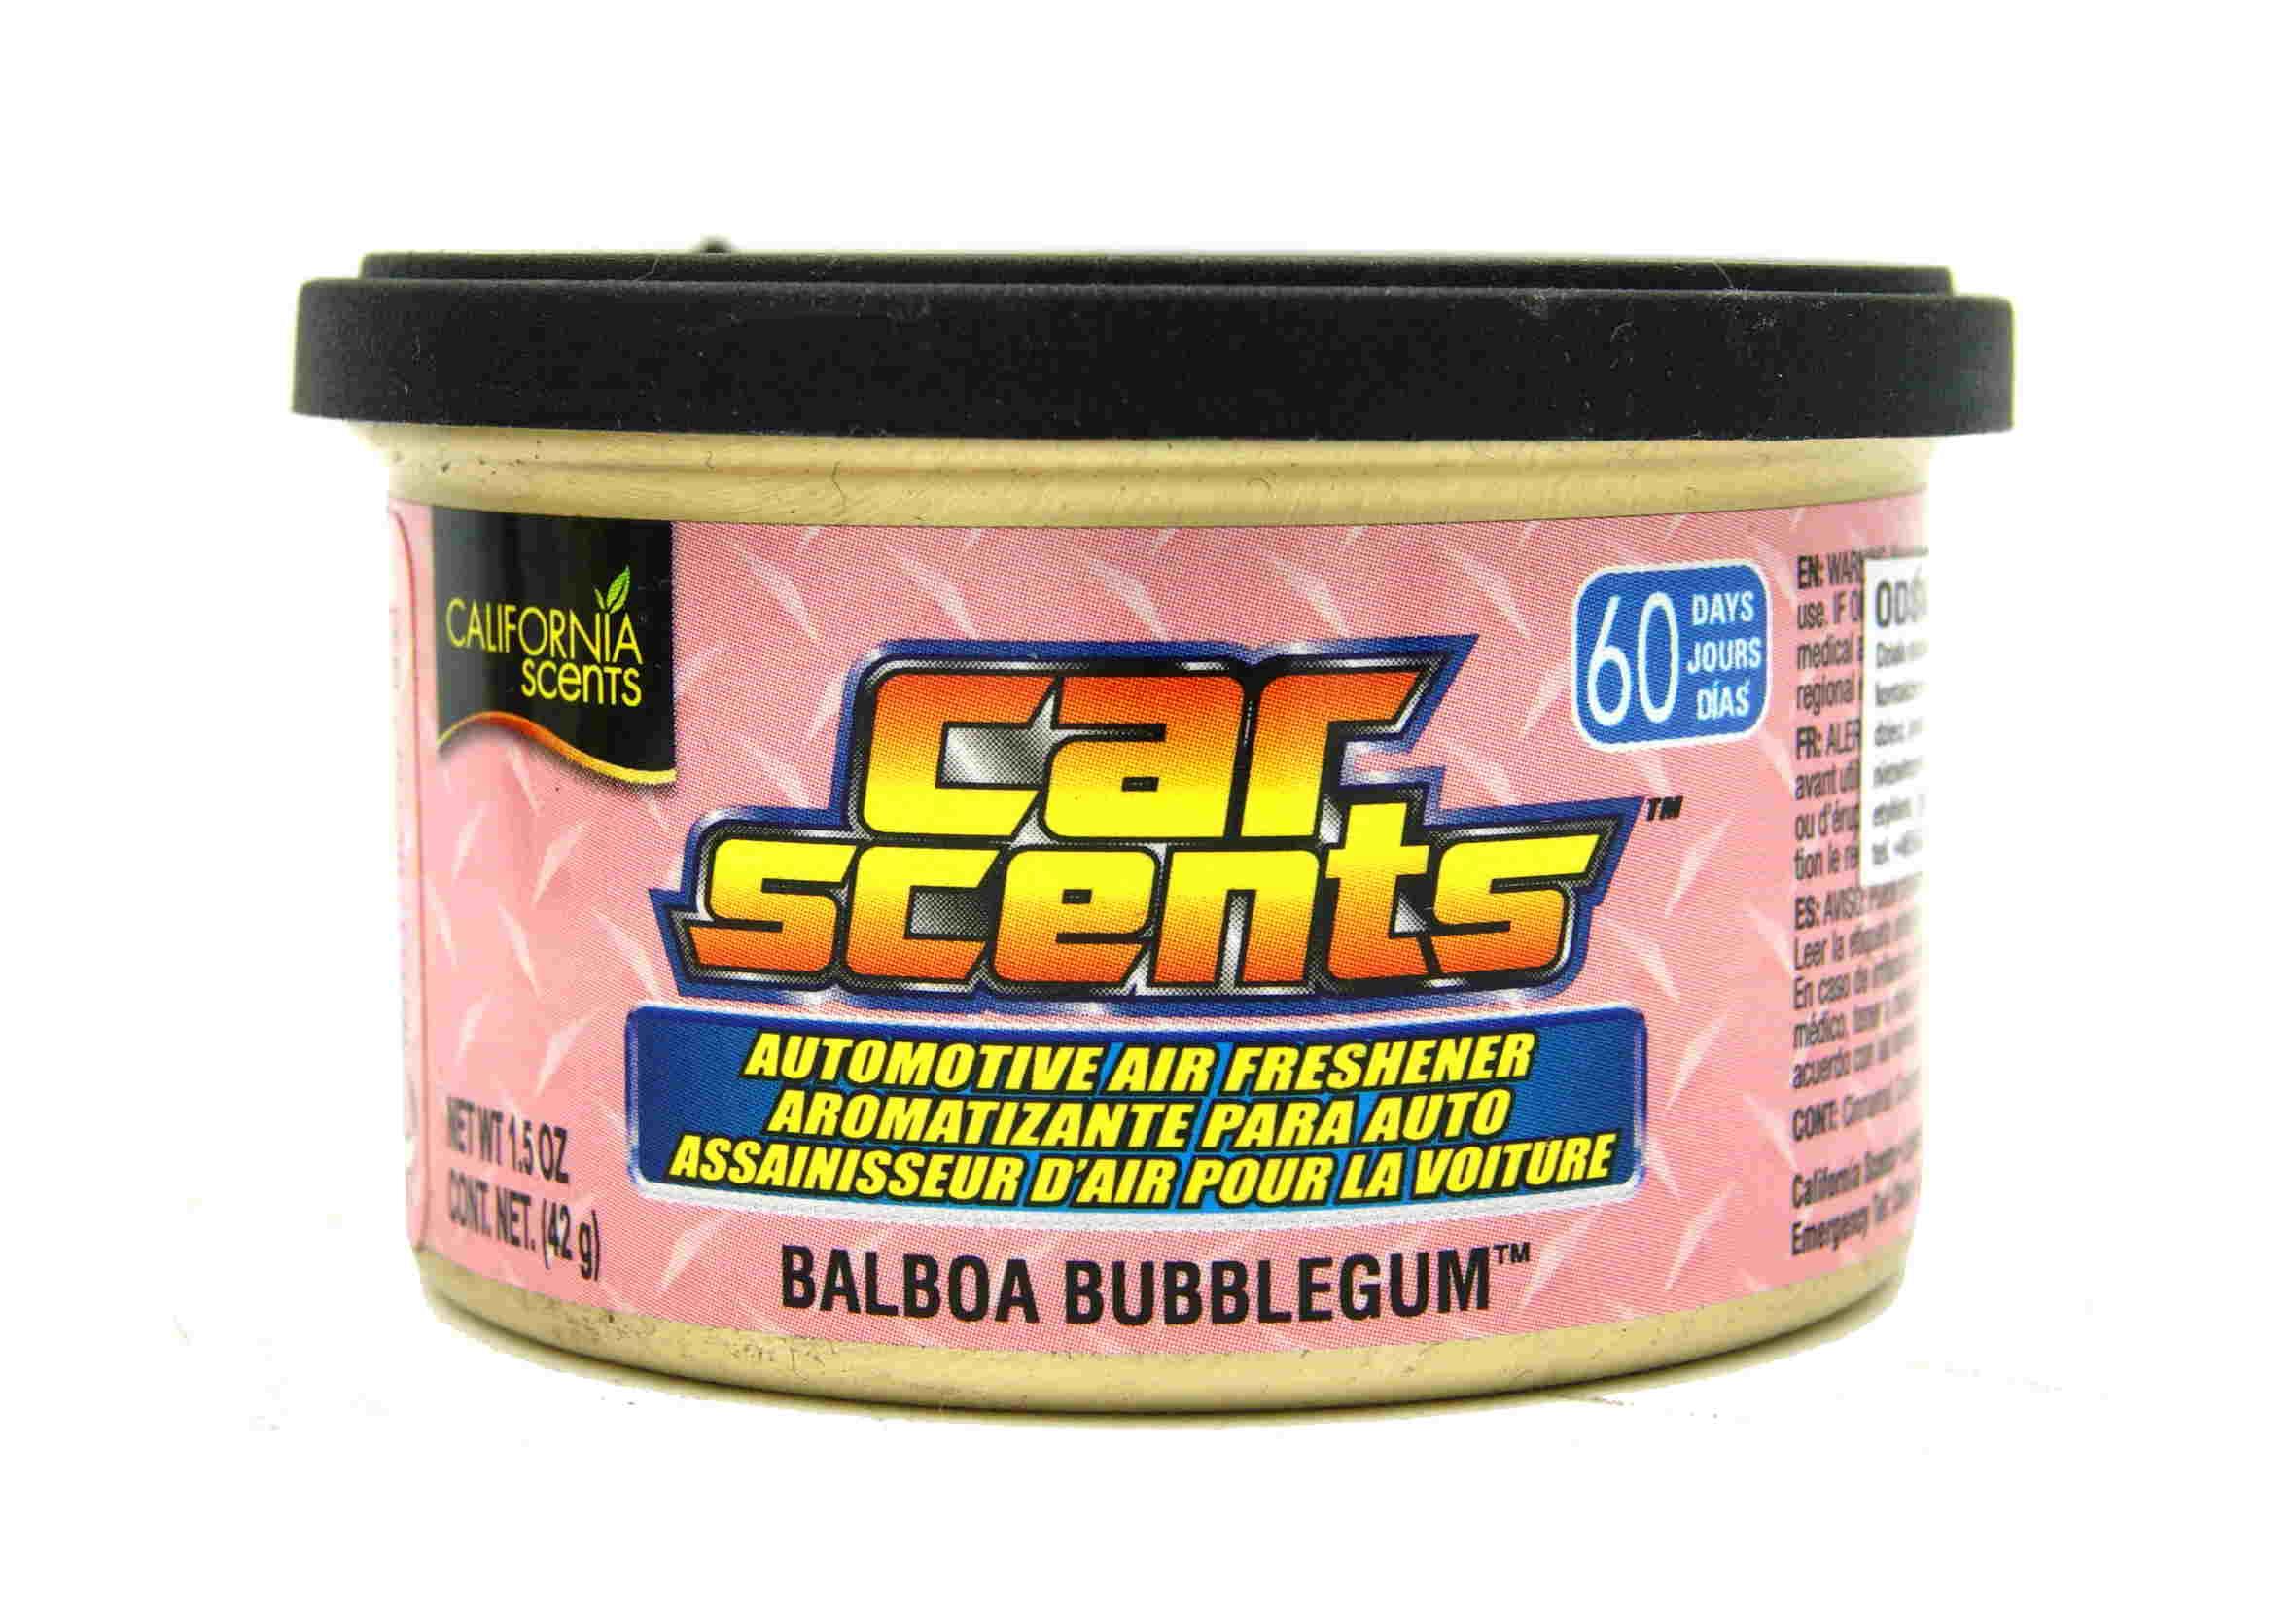 California Scents Balboa Bubblegum 42g Zapach Samochodowy Puszka